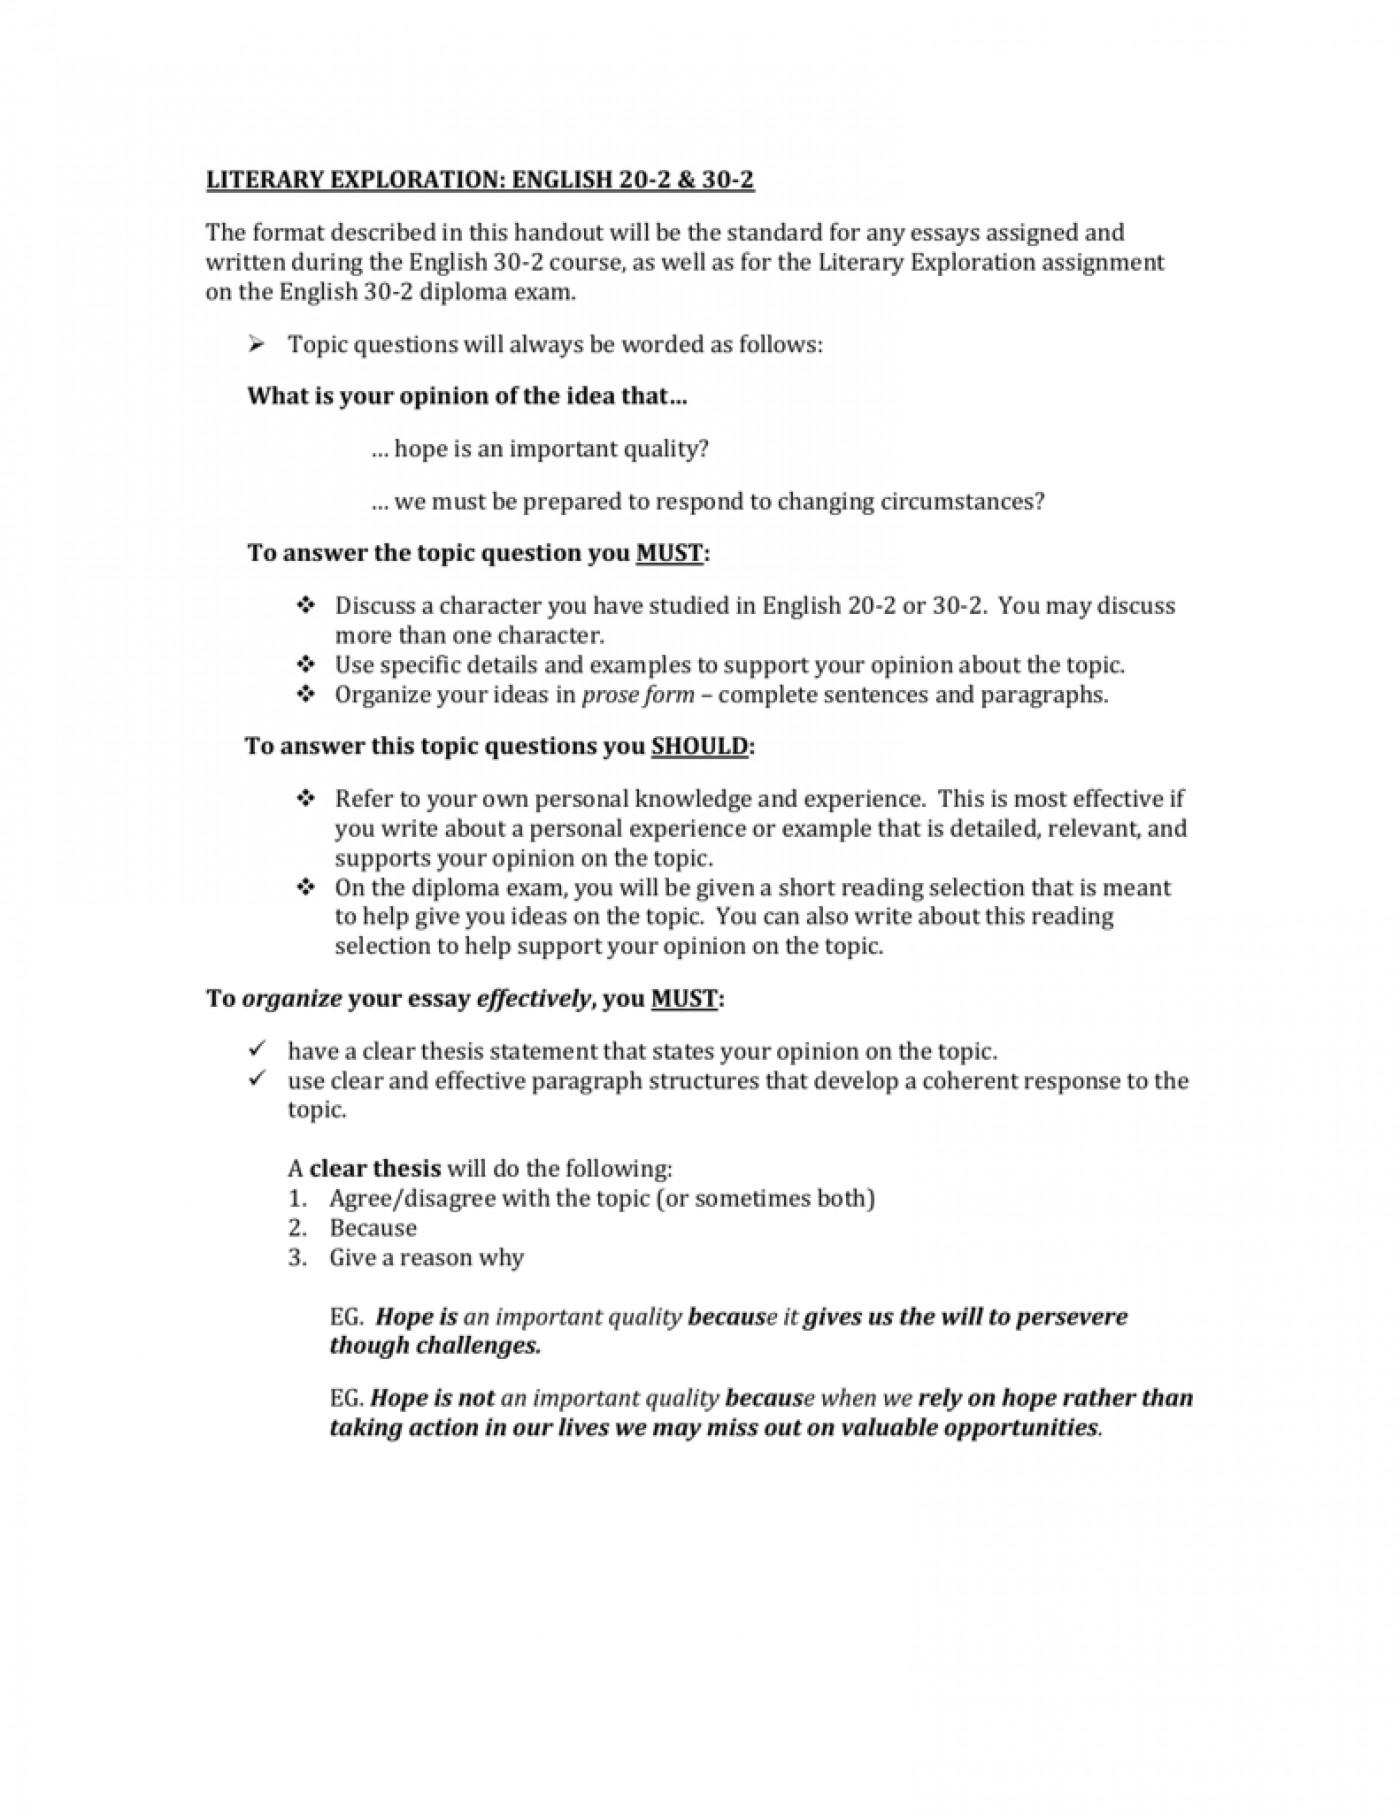 002 Essay Example English Examples Form 007481393 1 Wondrous 2 1400